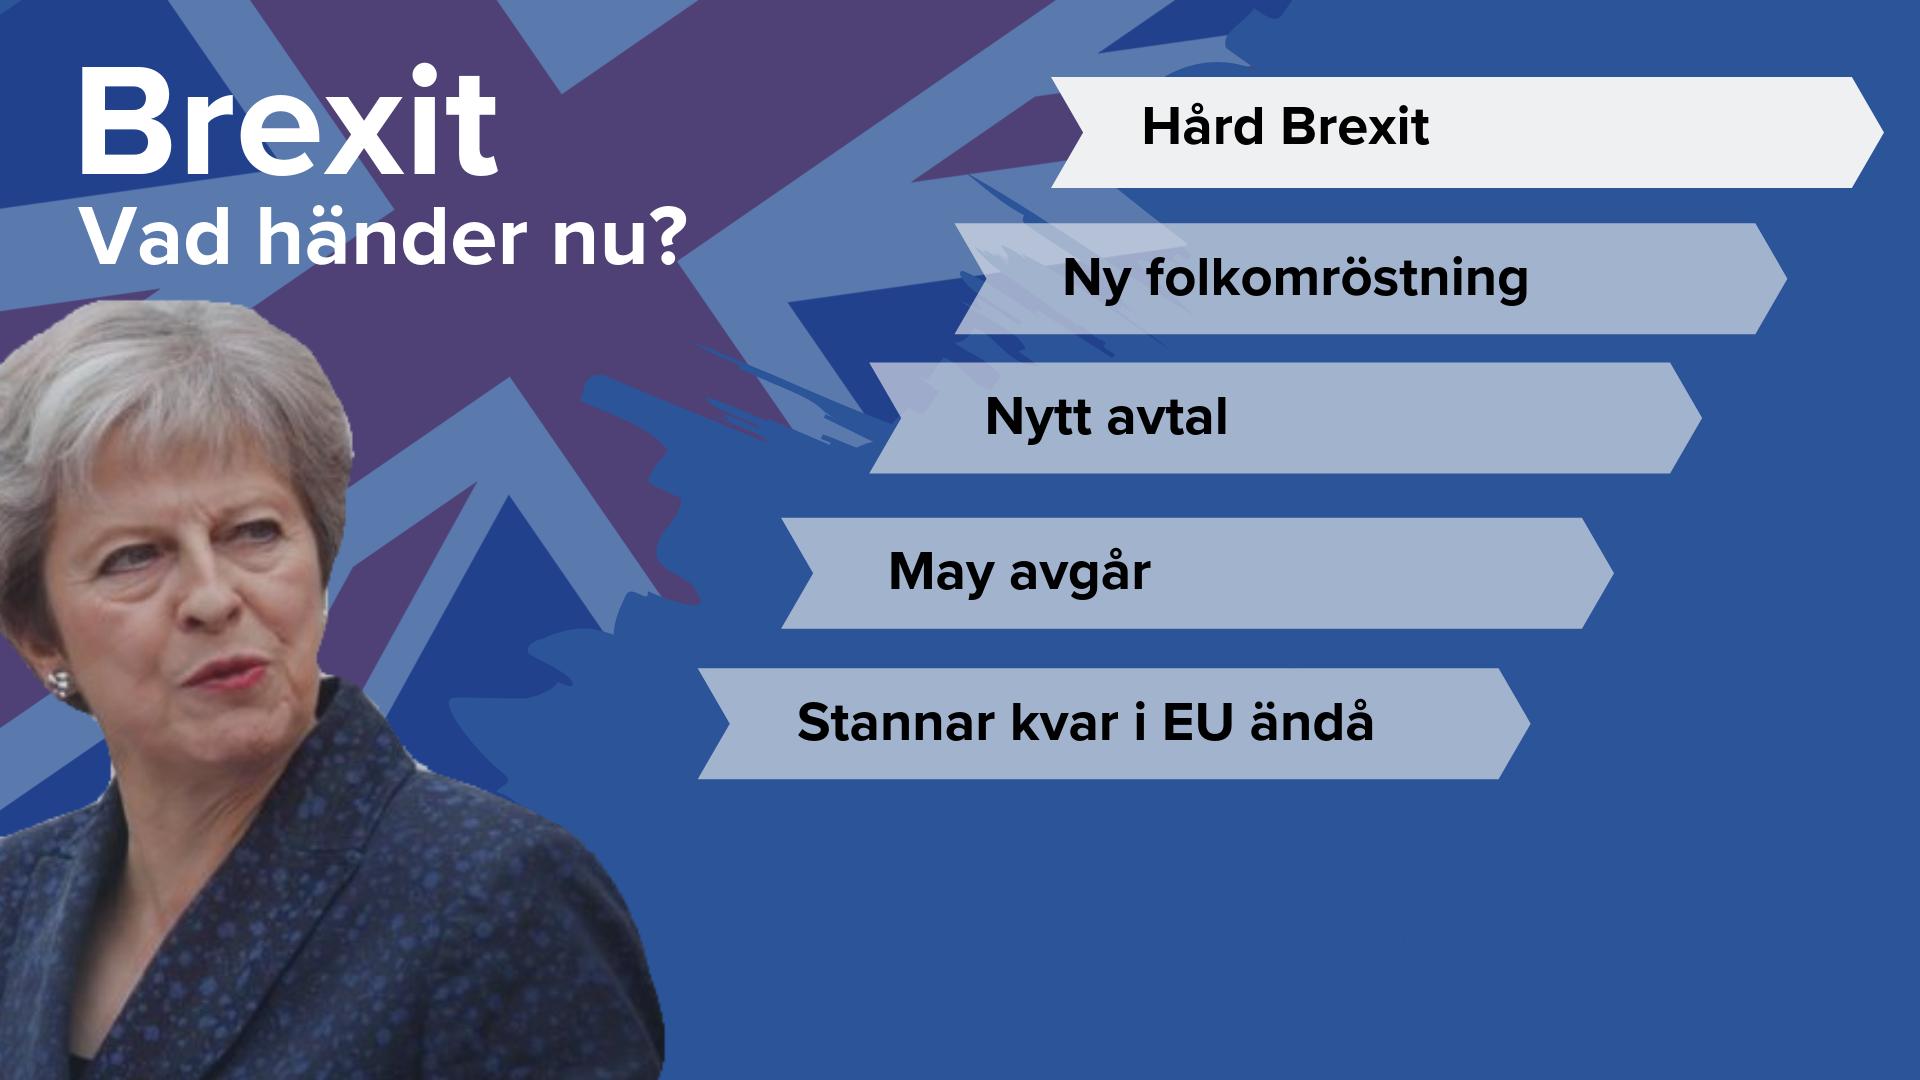 Hård Brexit